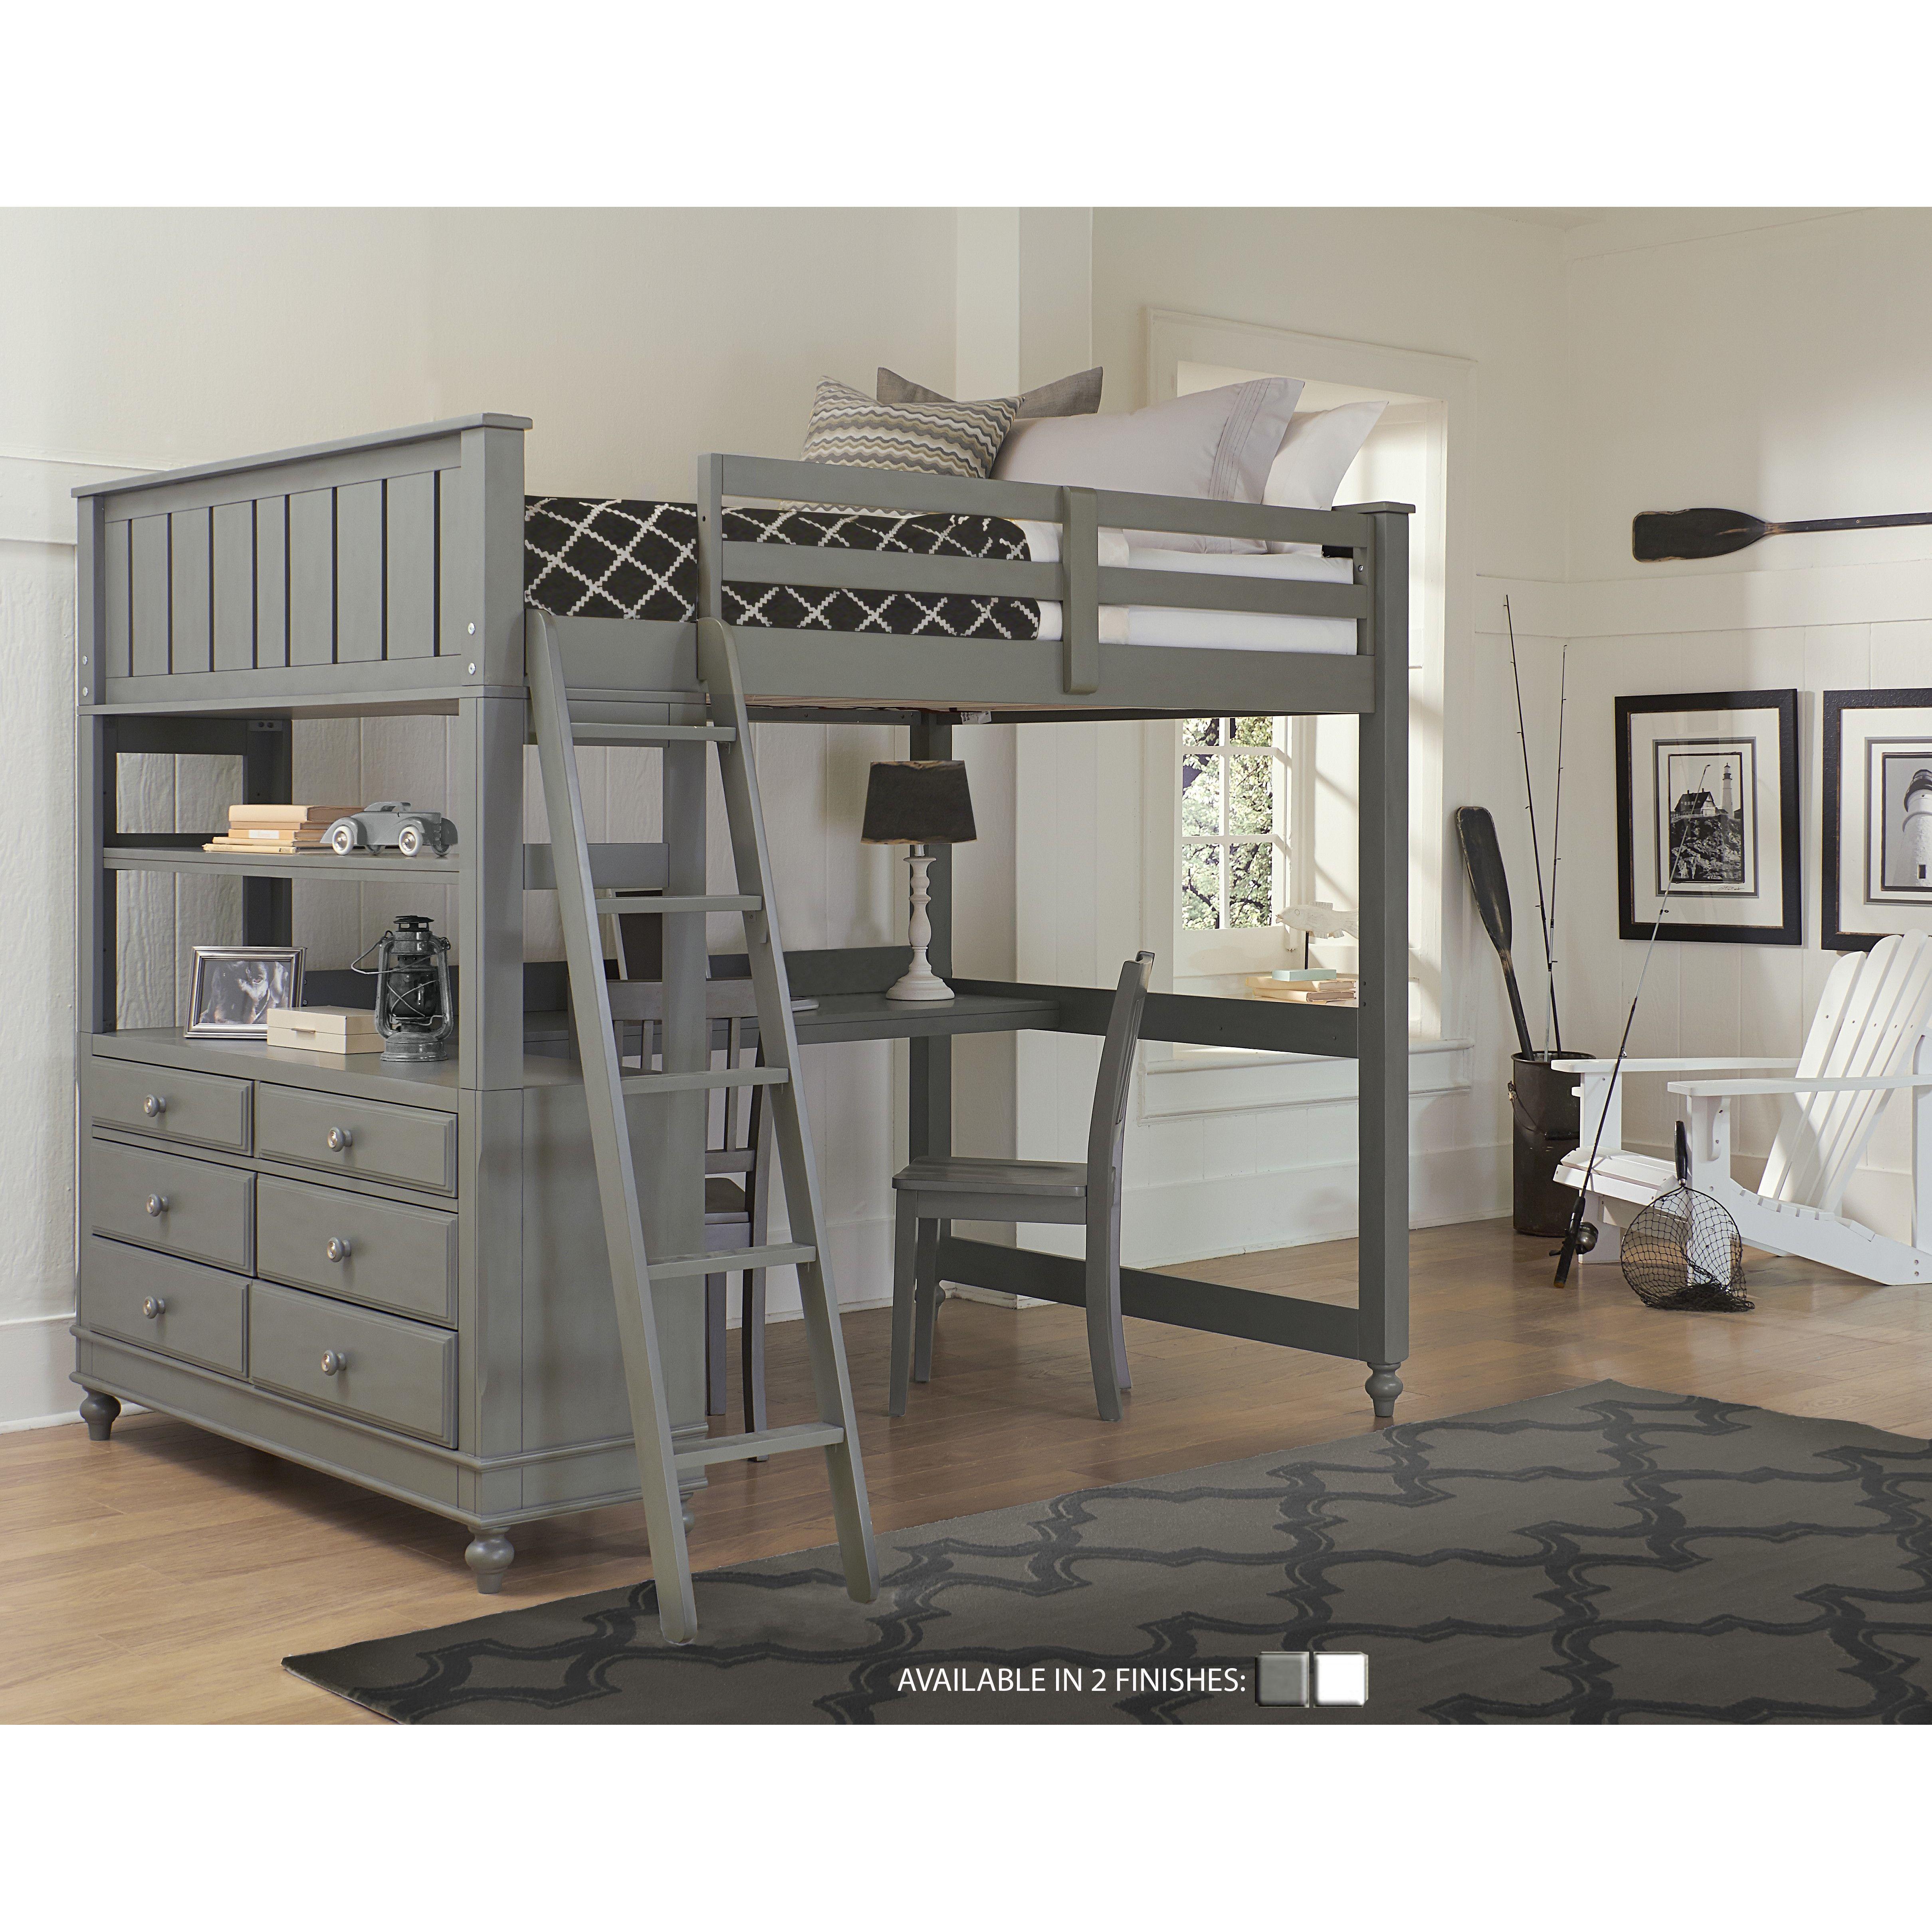 Viv + Rae™ Wendy Loft Customizable Bedroom Set | Decor | Pinterest ...